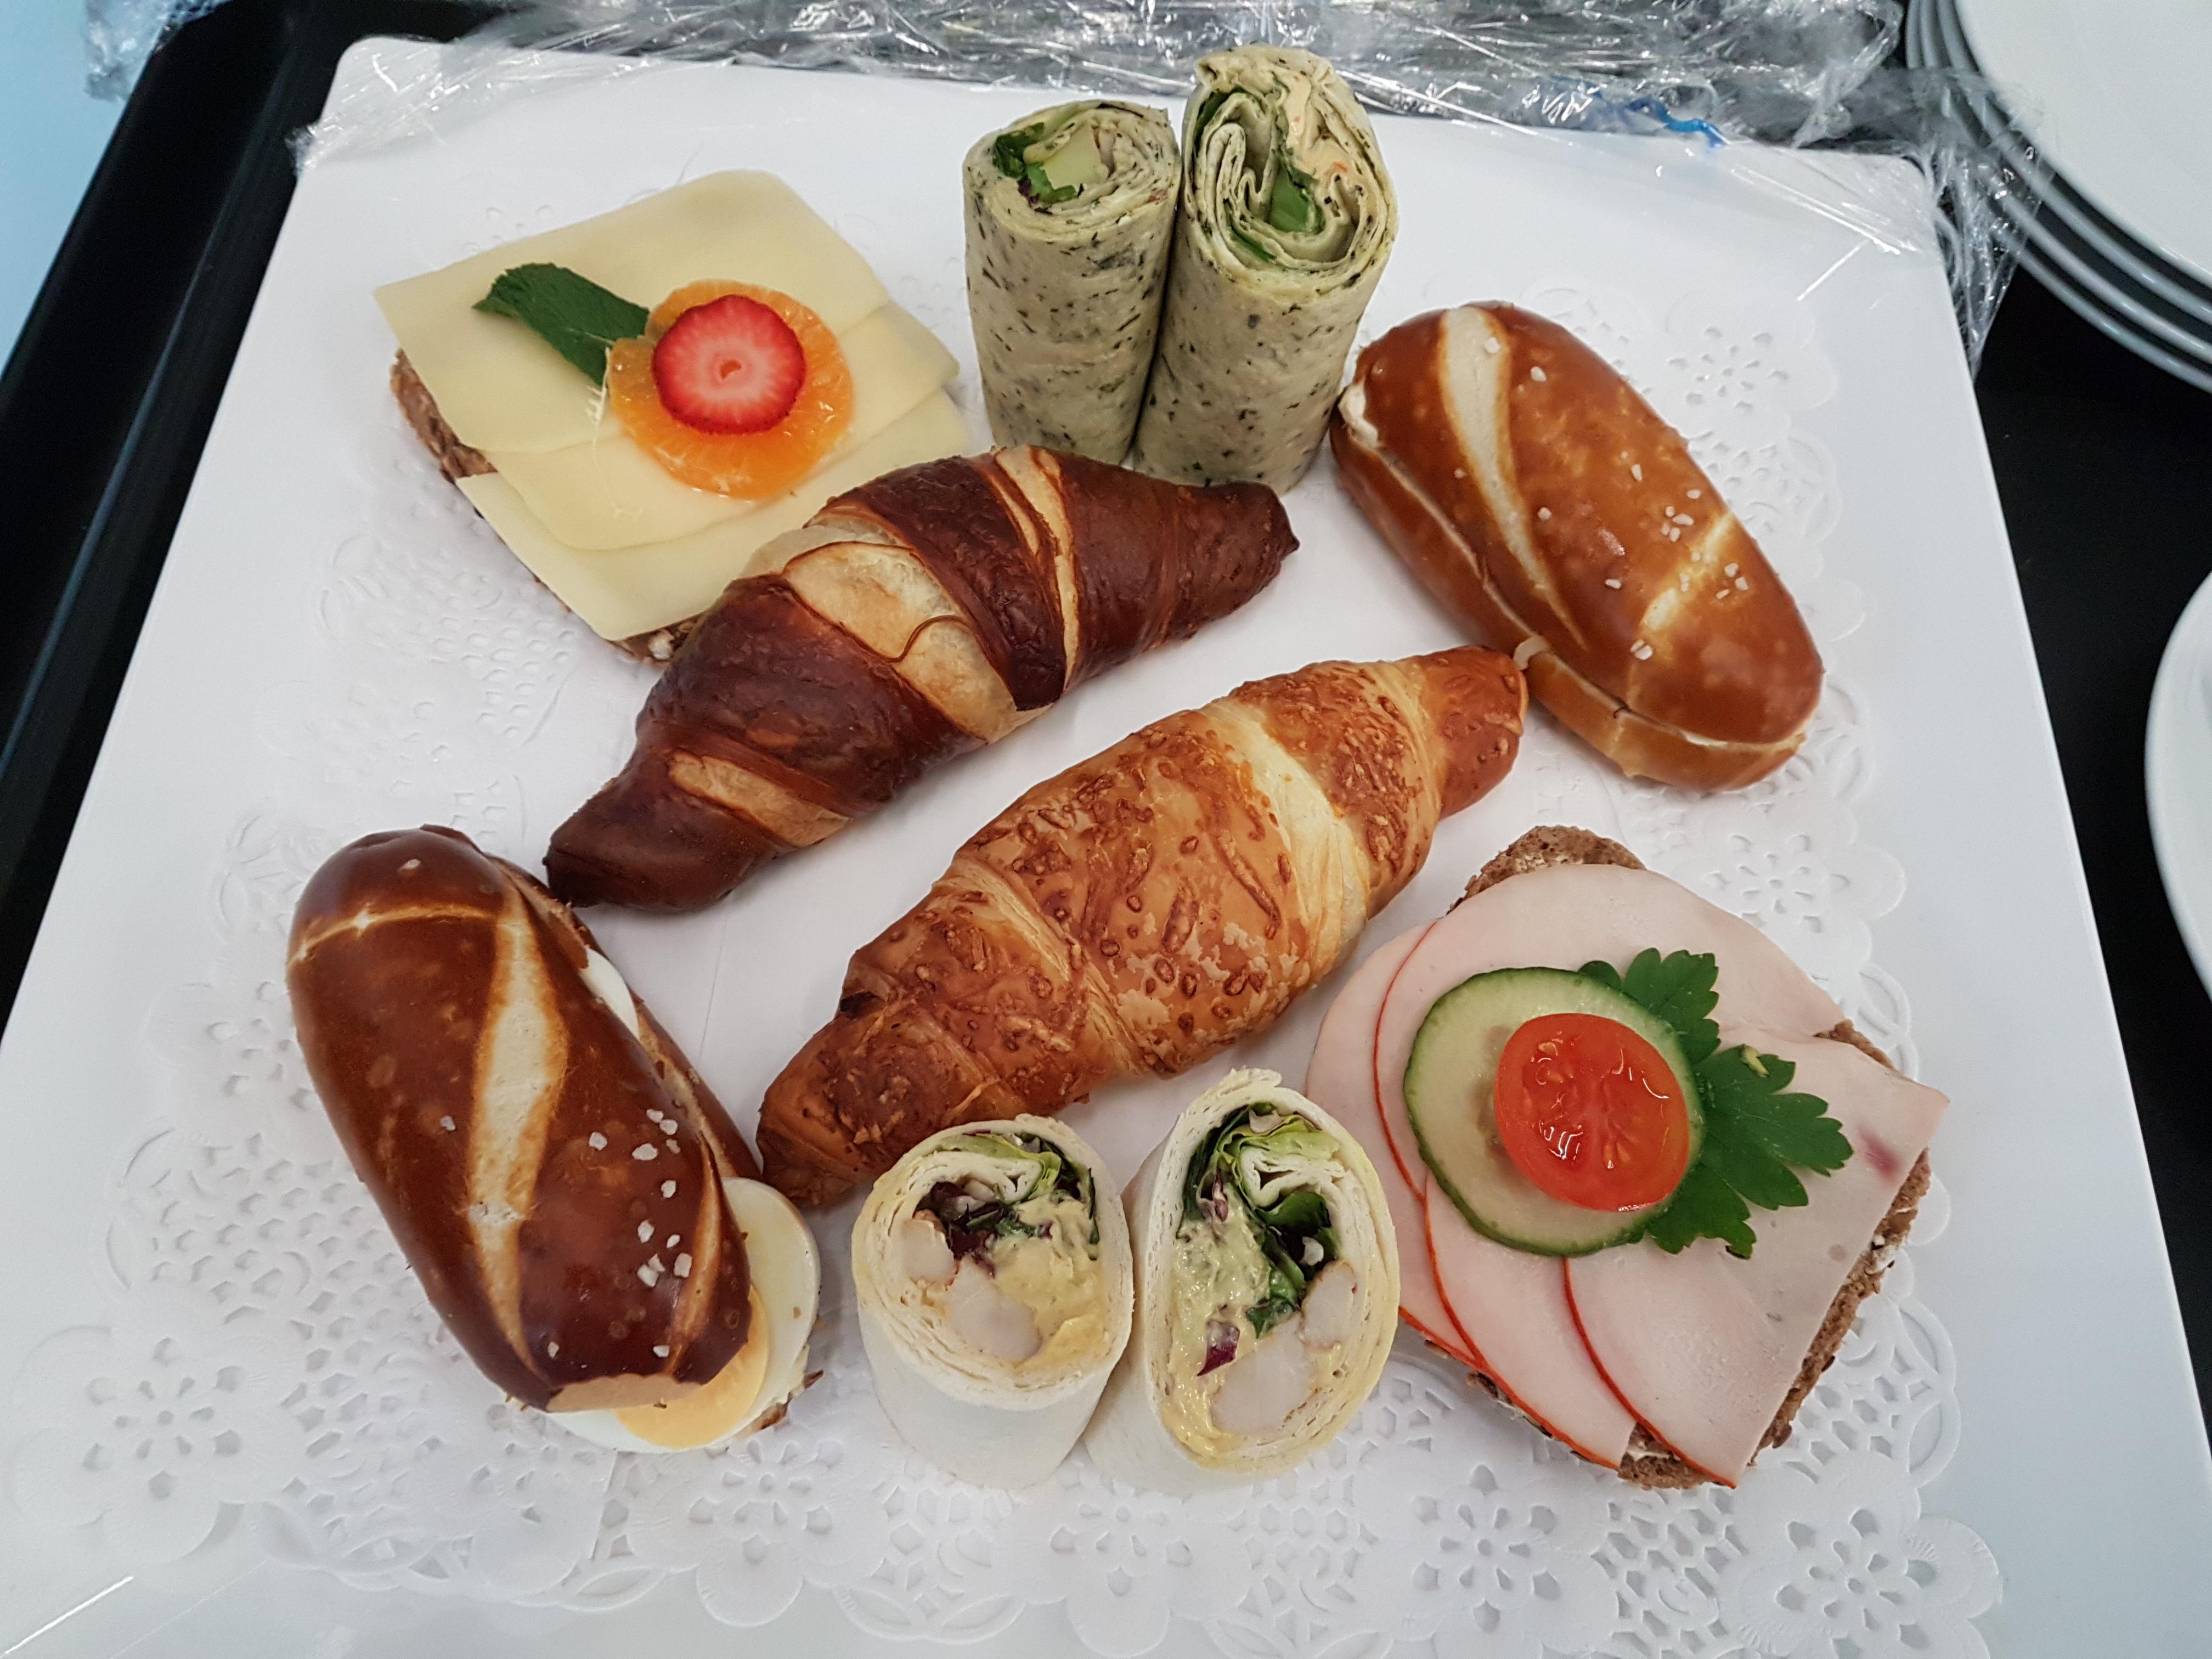 https://foodloader.net/Holz_2020-02-25_Snacks.jpg